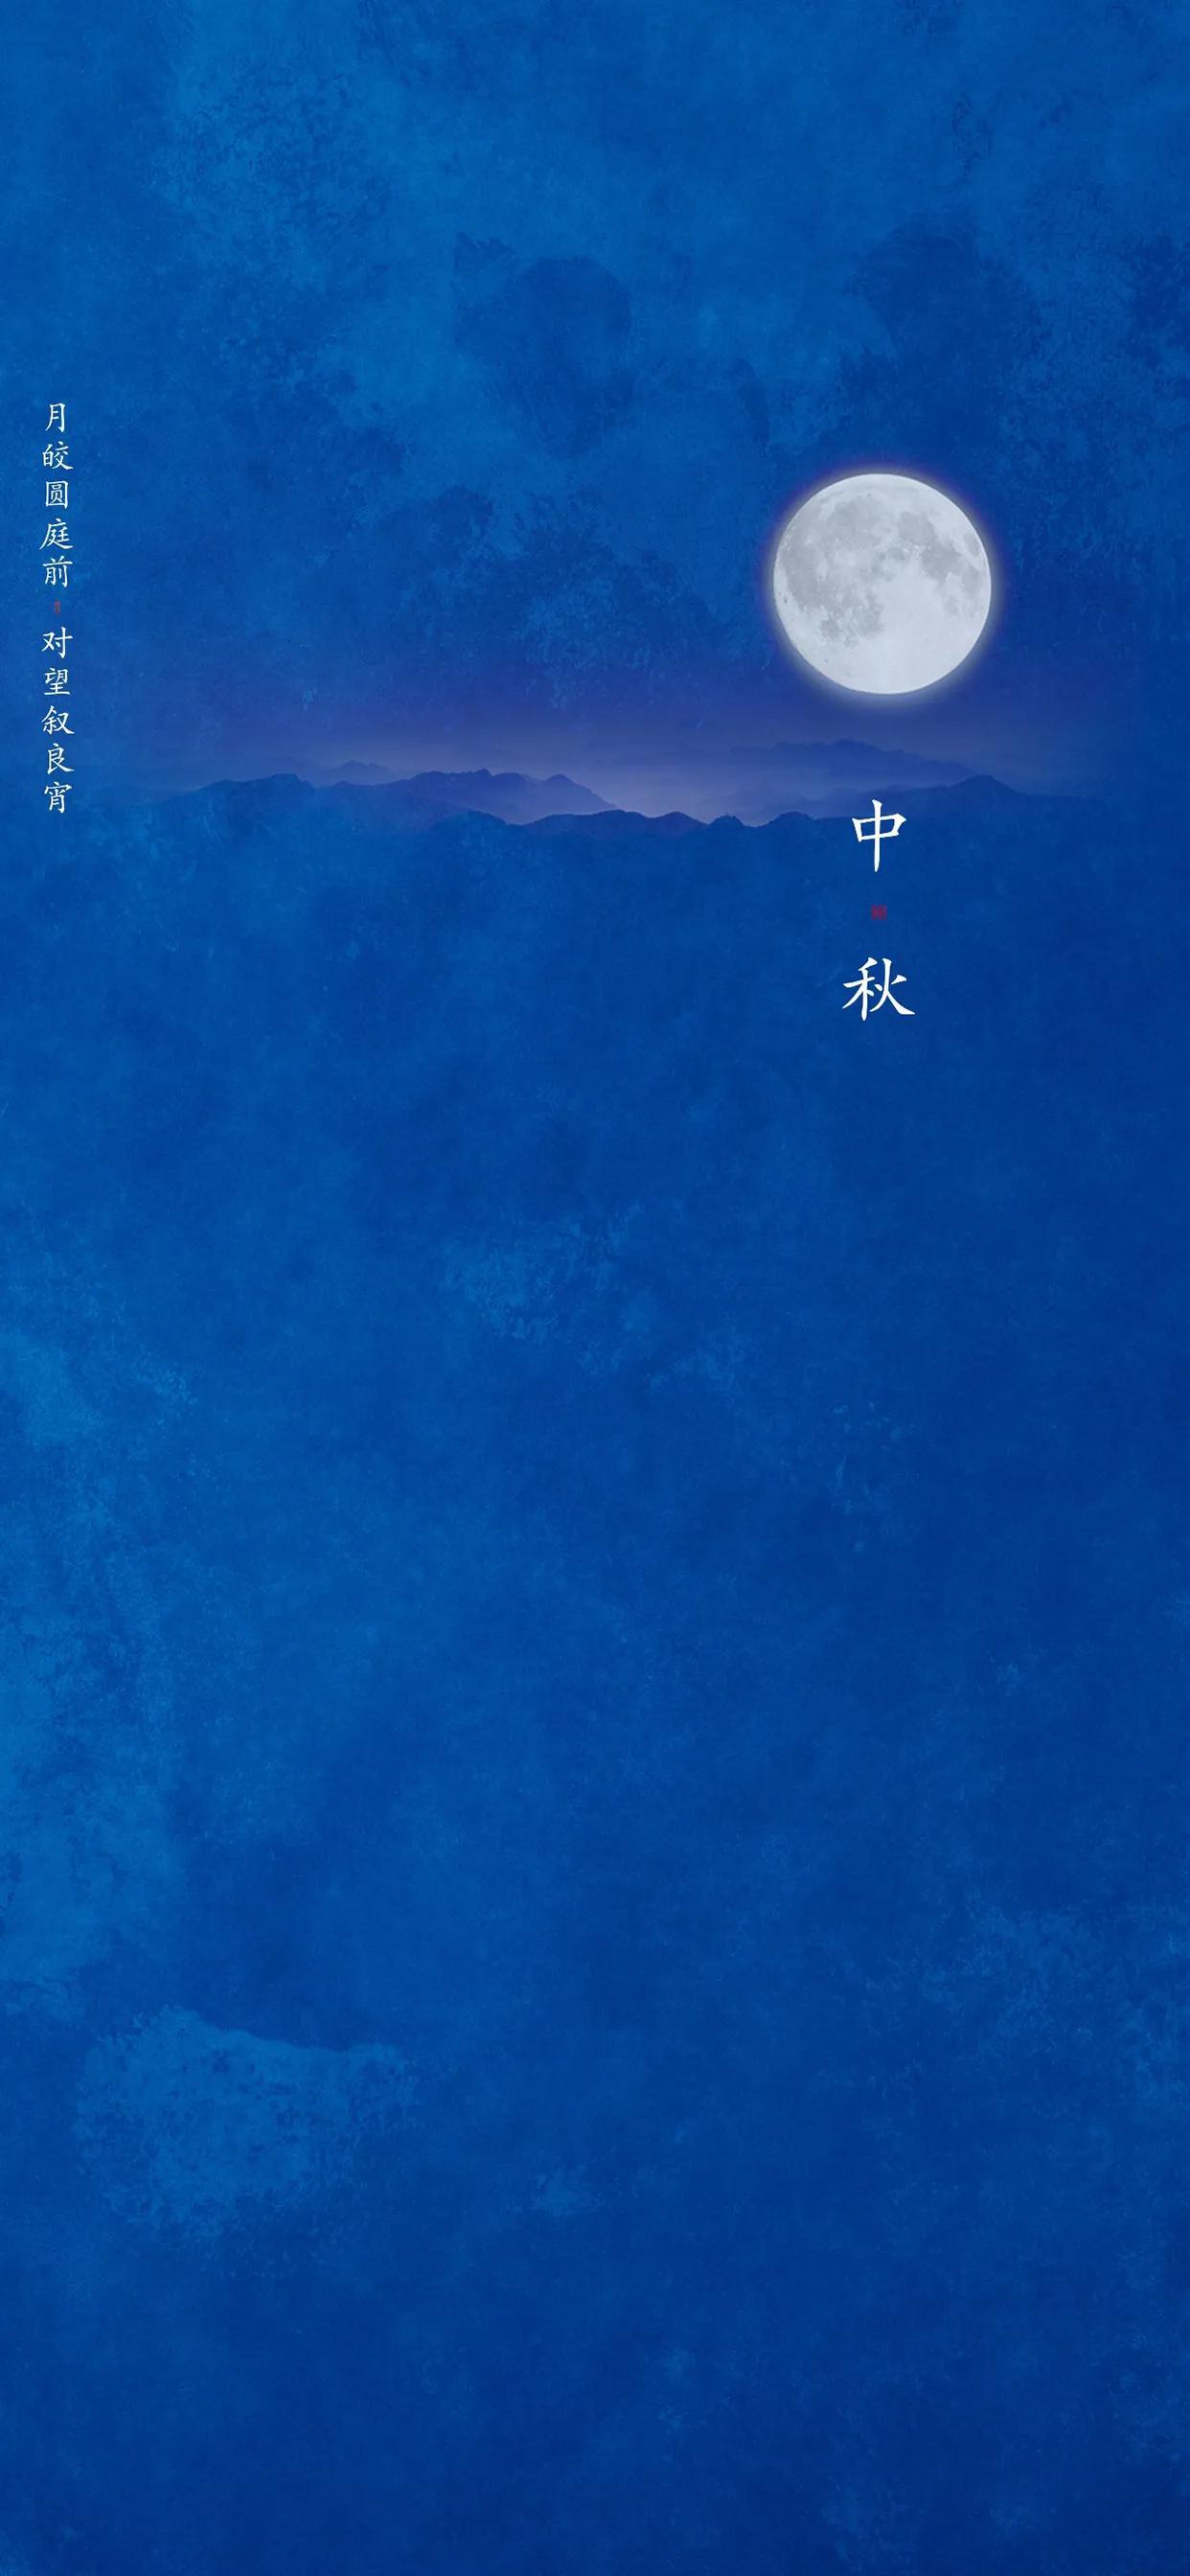 iPhone手机中秋节壁纸